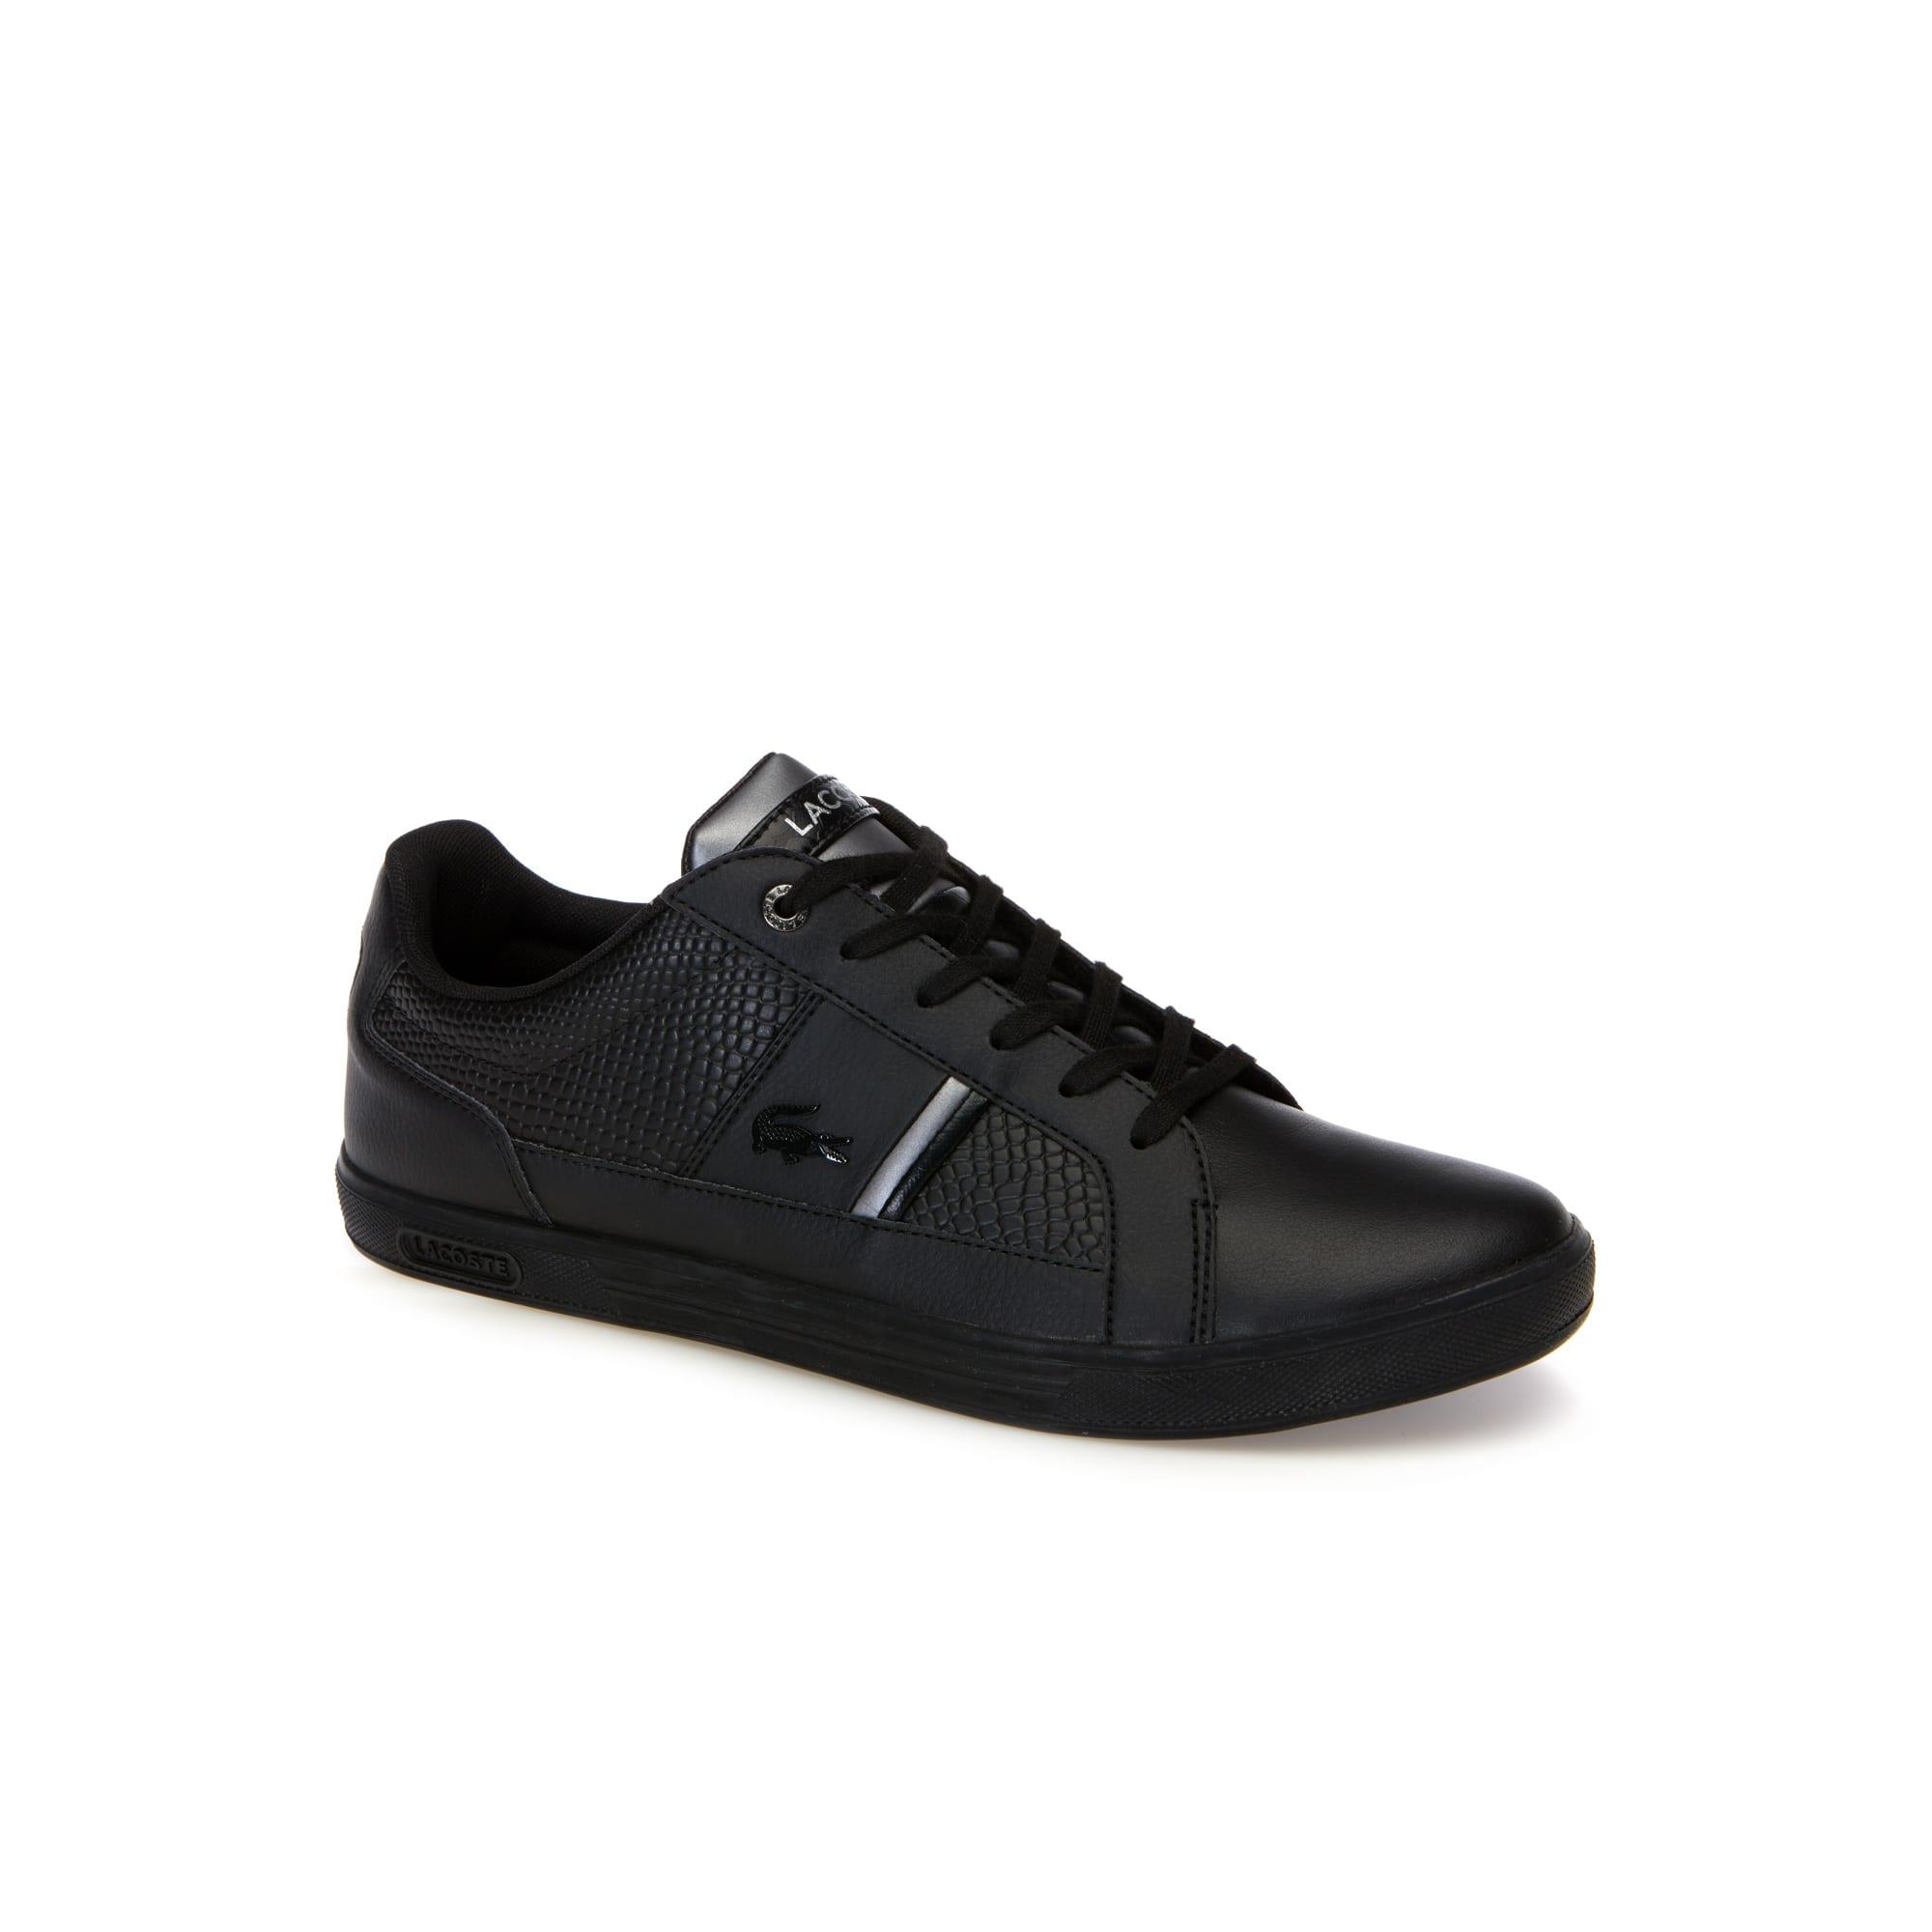 Herren-Sneakers EUROPA aus Leder